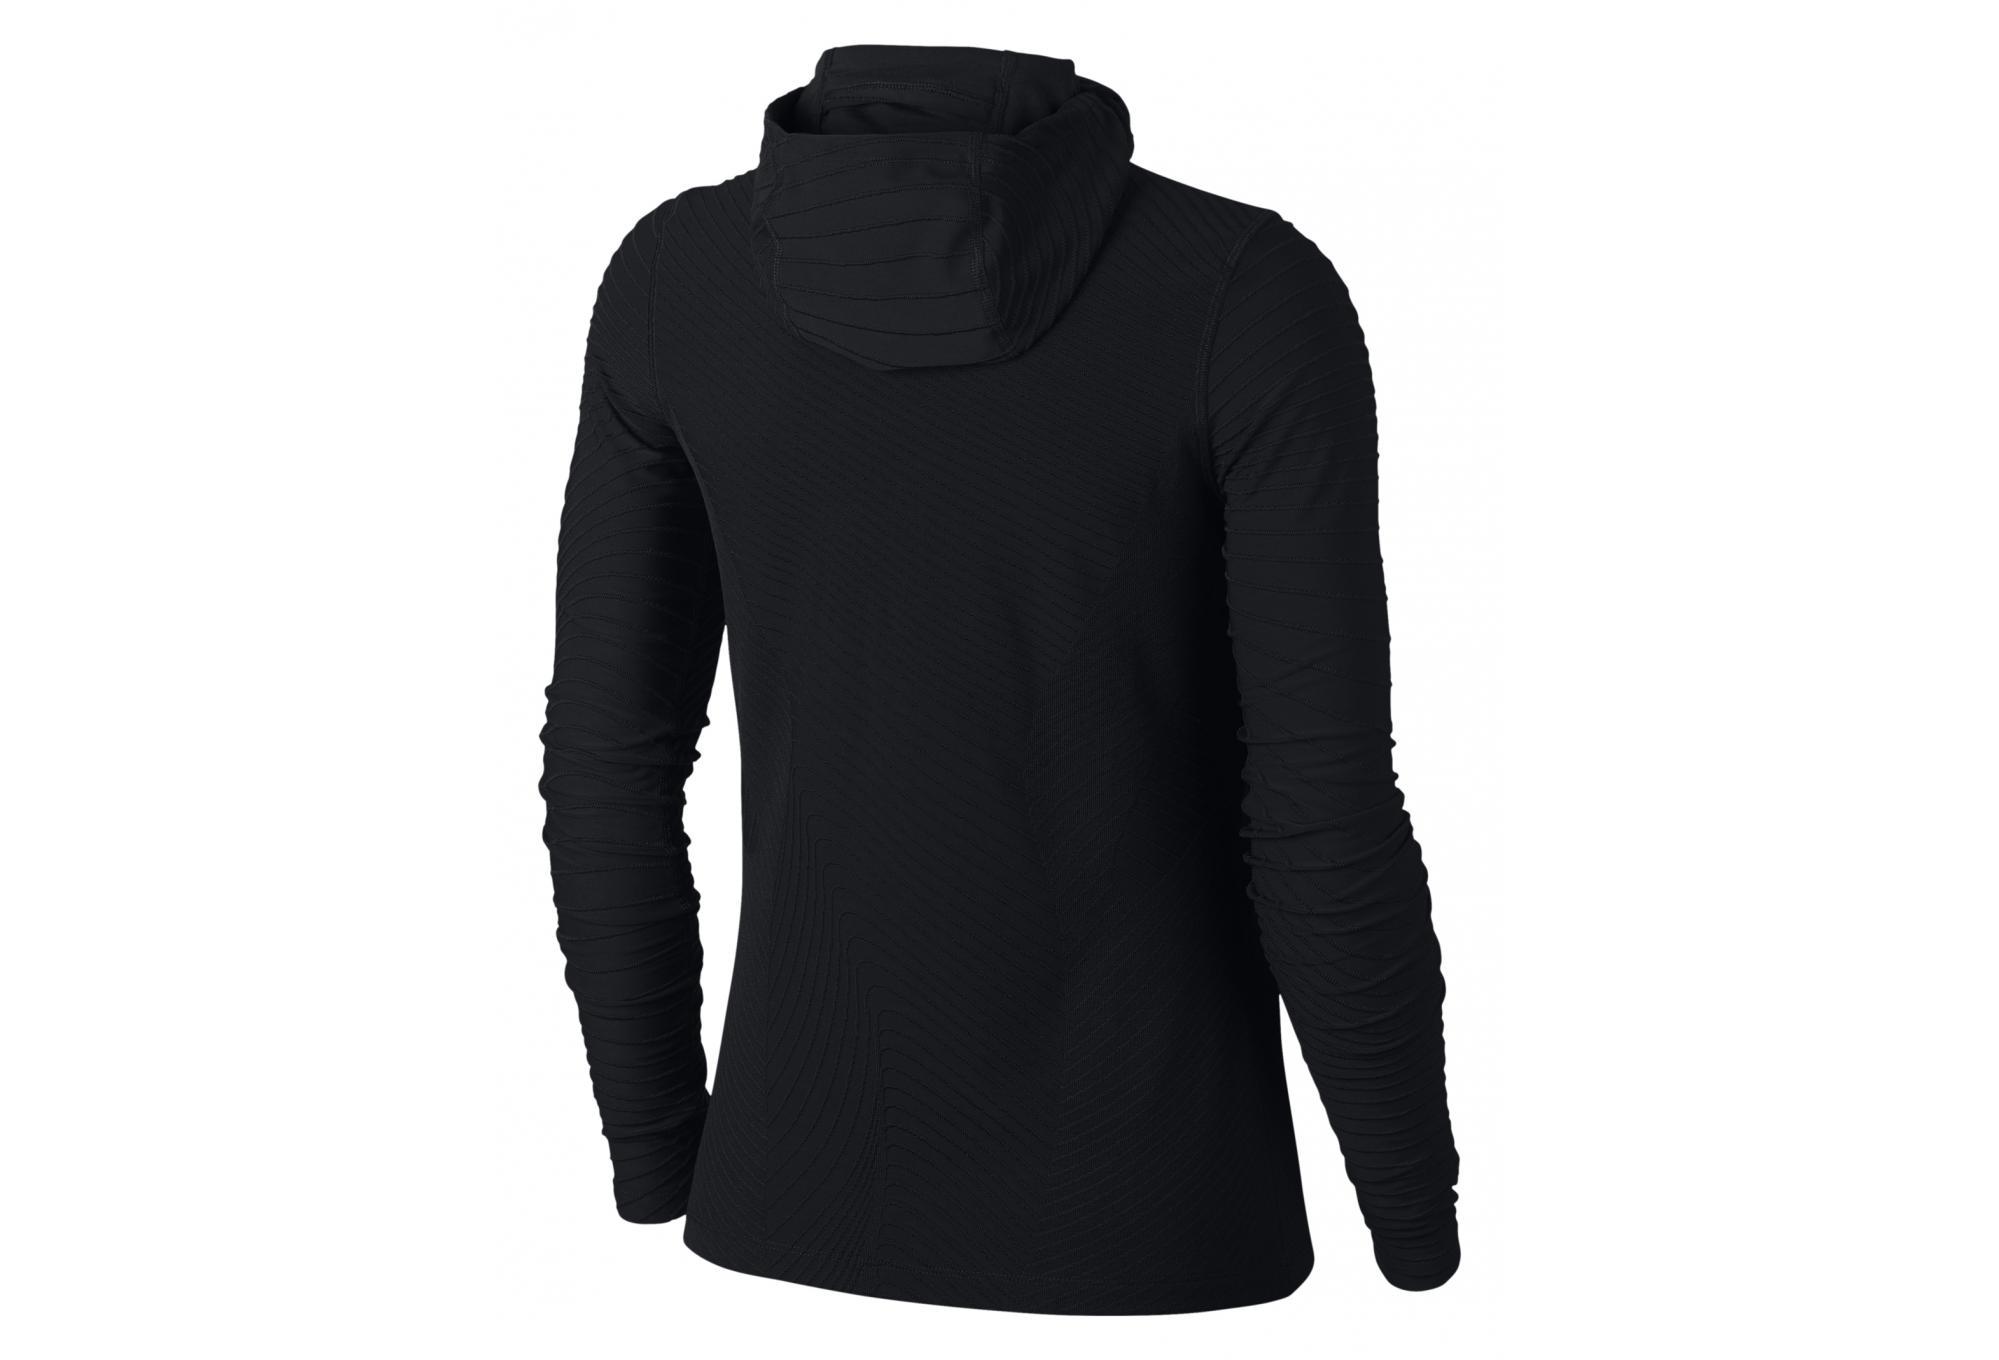 0c310583194 Nike Element Women s Hooded Long Sleeves Jersey Black